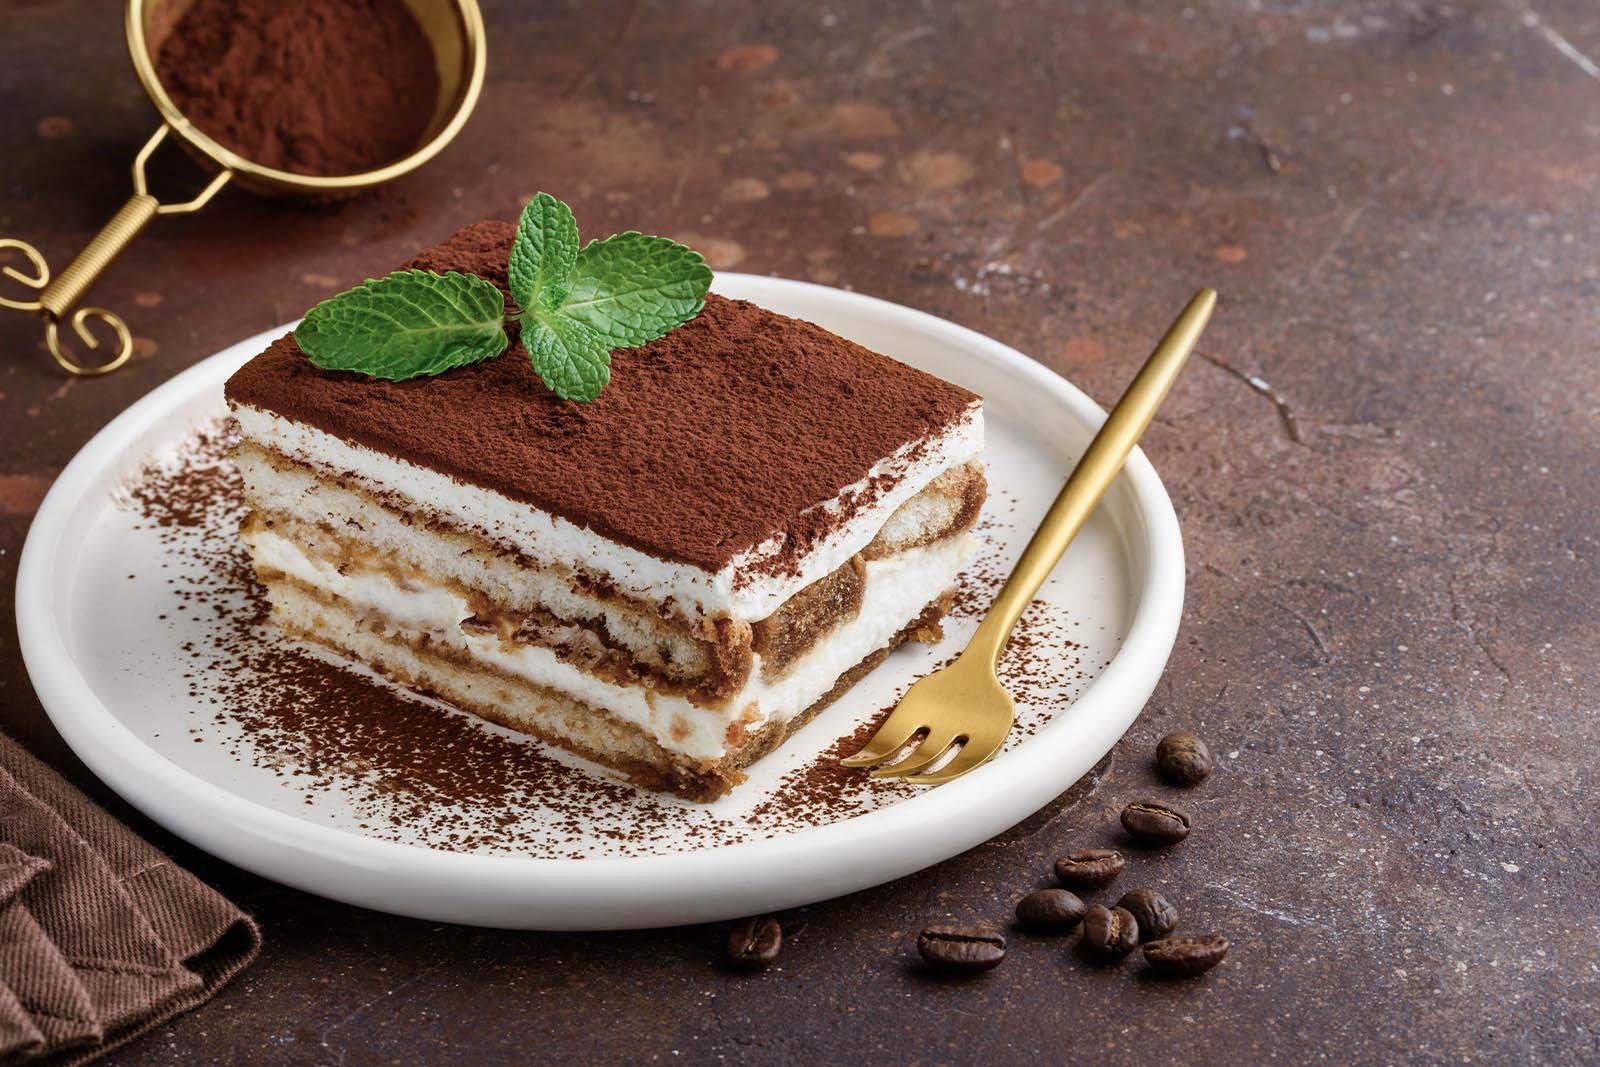 a piece of tiramisu cake